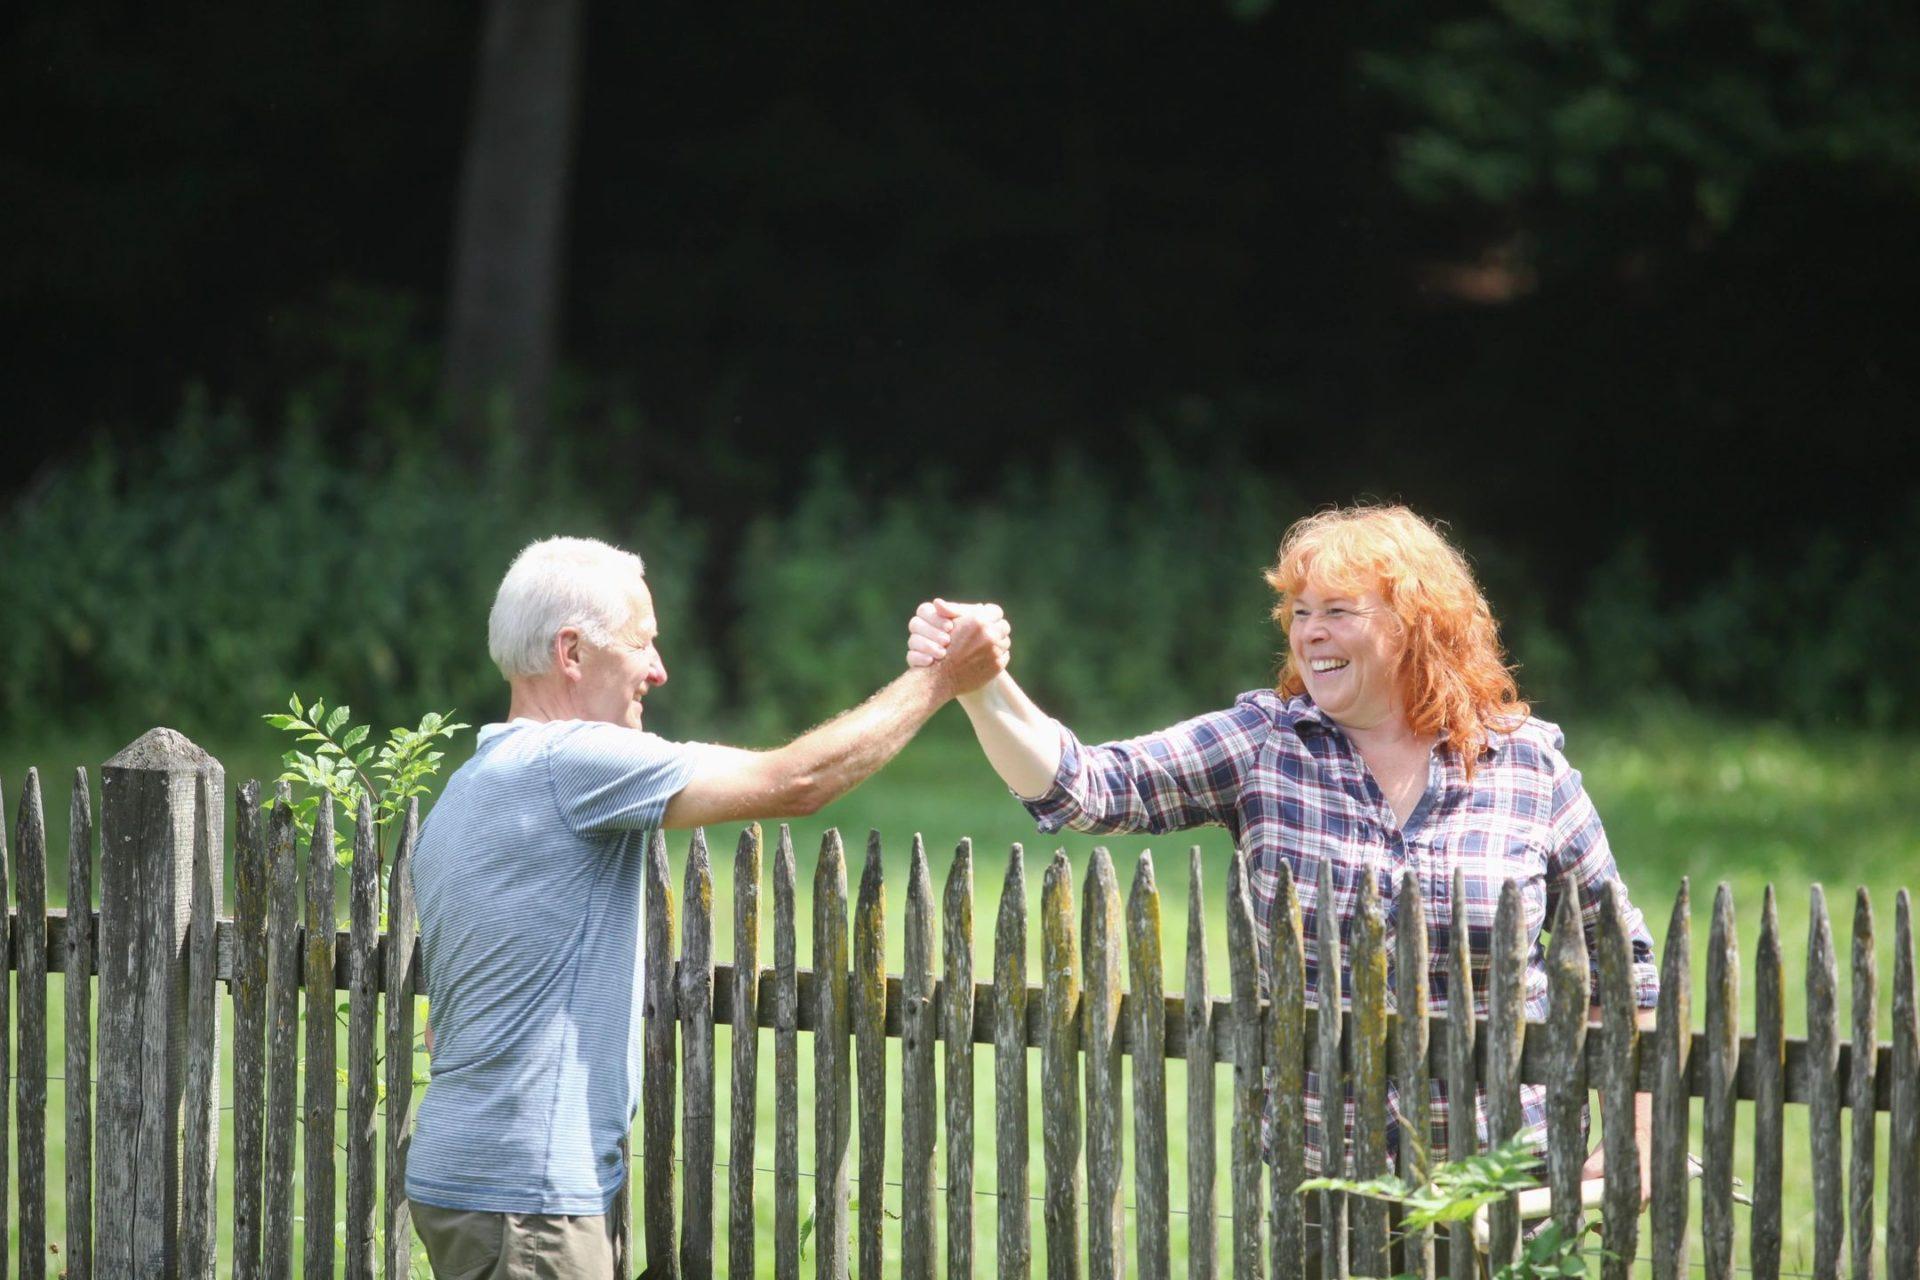 Two older people grabbing hands over fence smiling